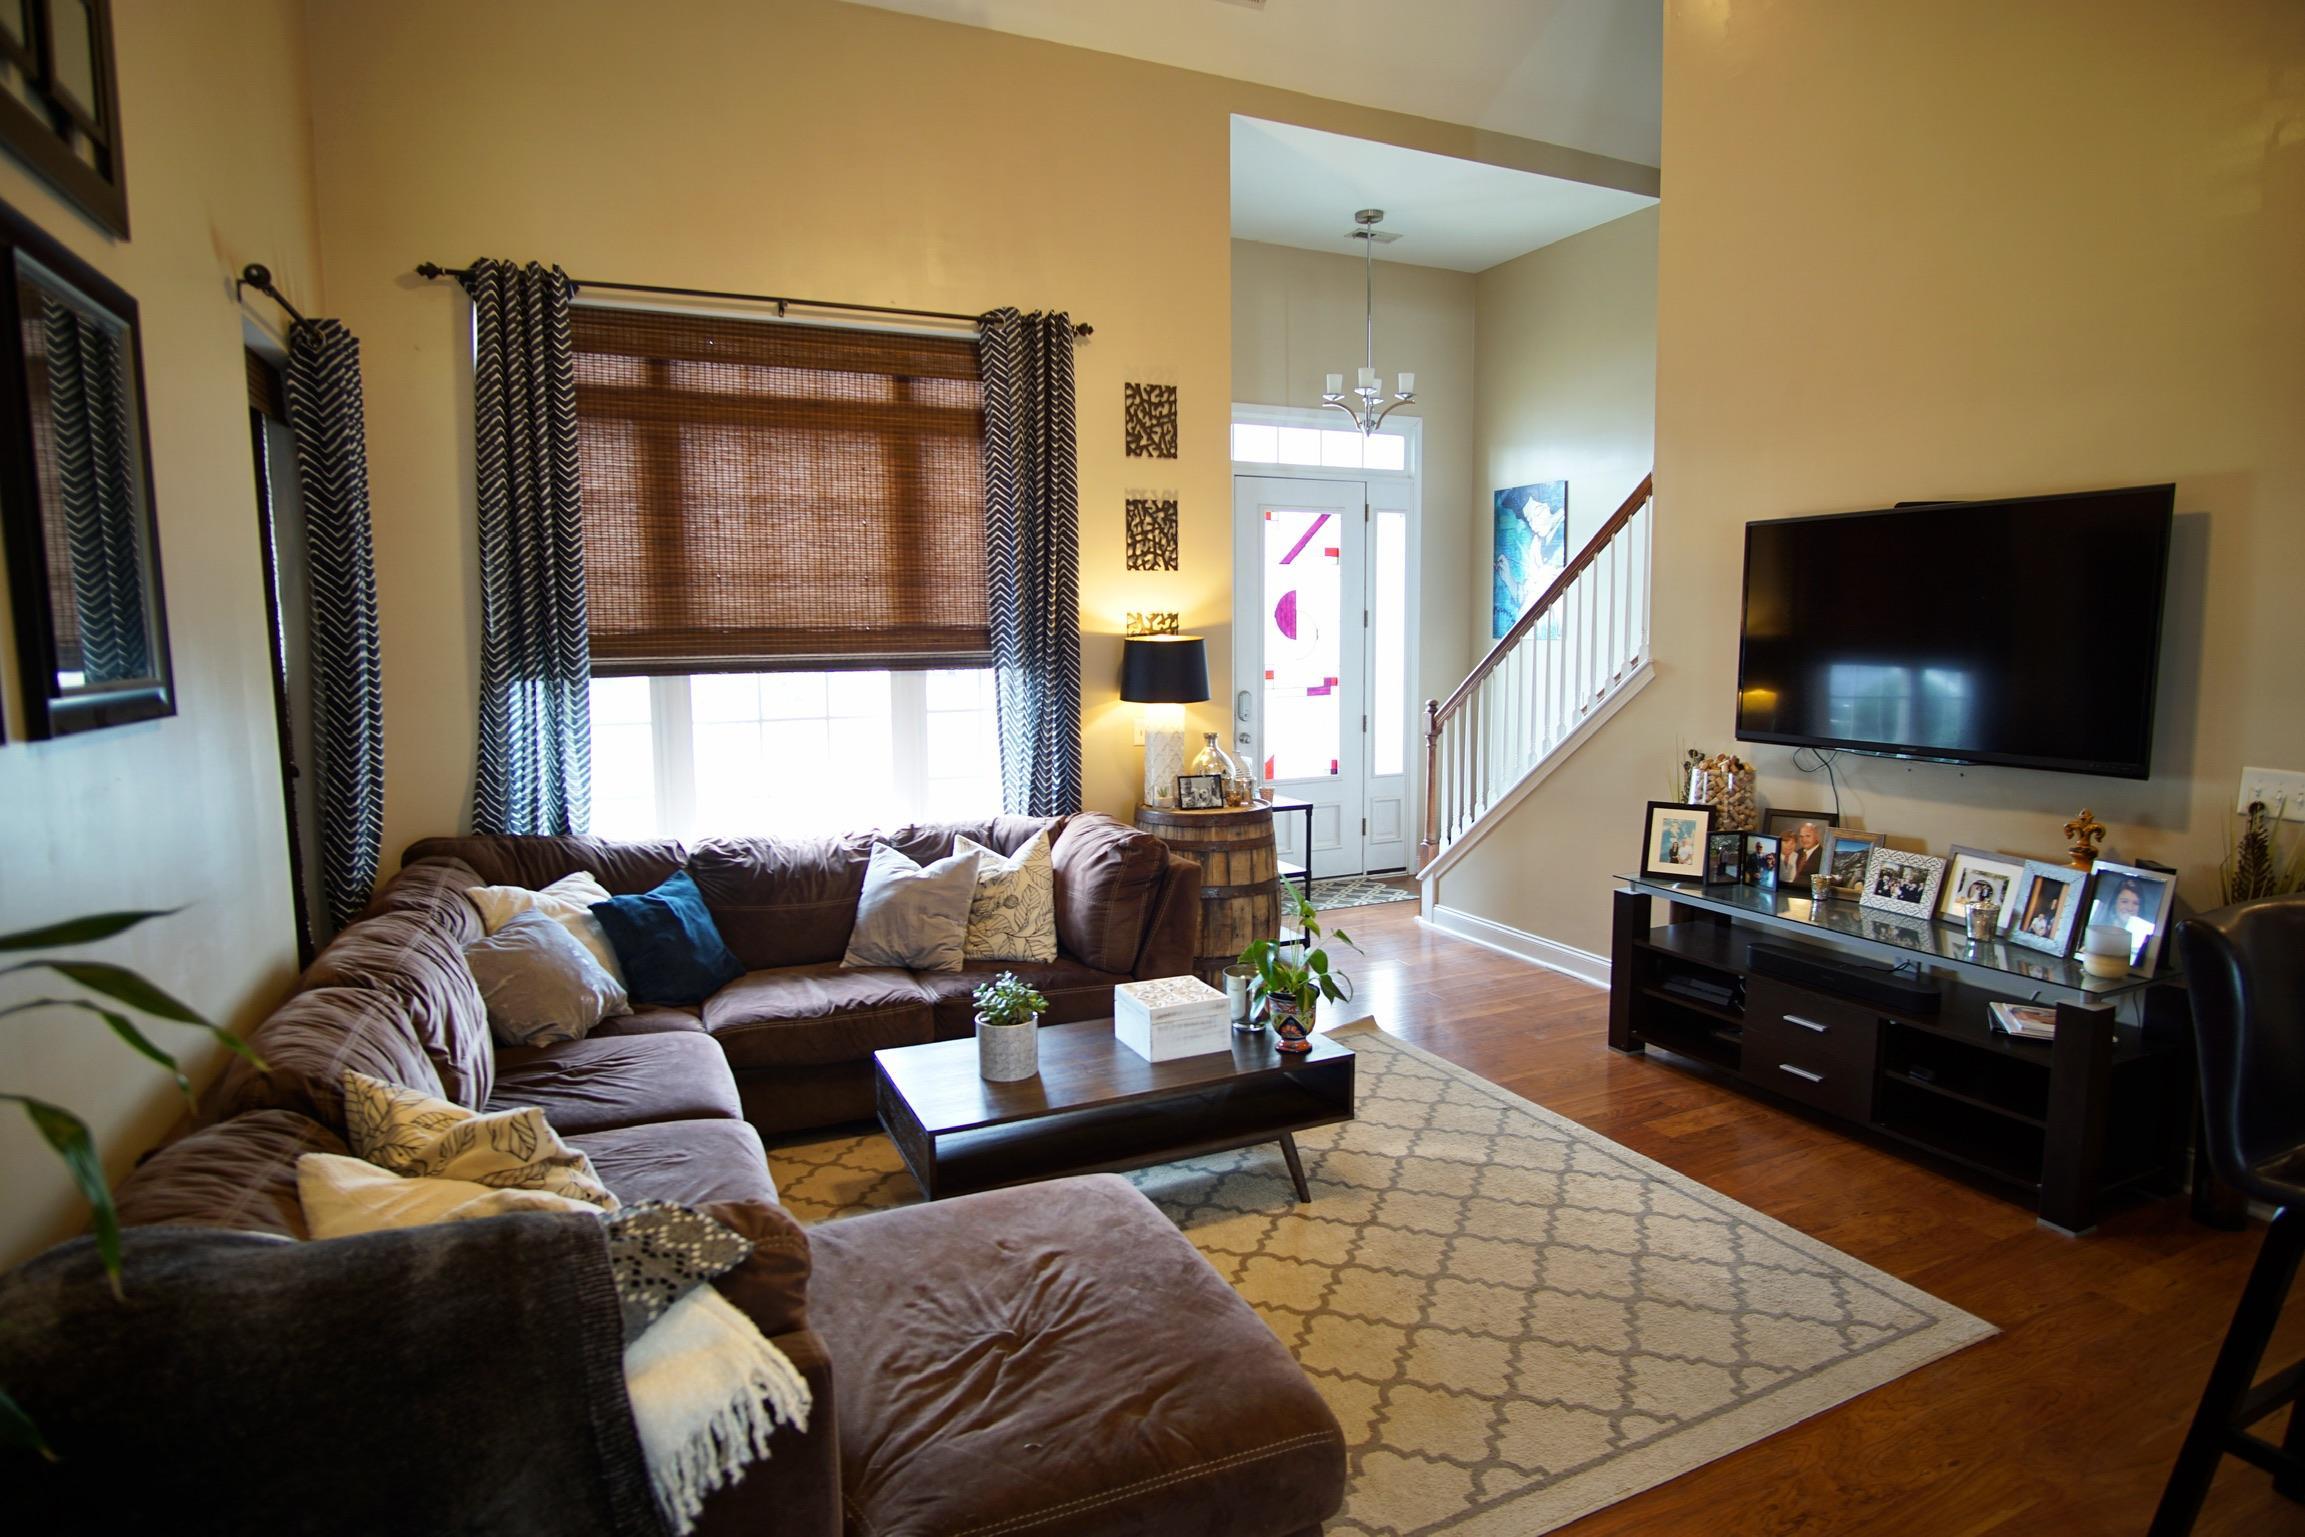 Colony North II Homes For Sale - 7828 Magellan, North Charleston, SC - 6